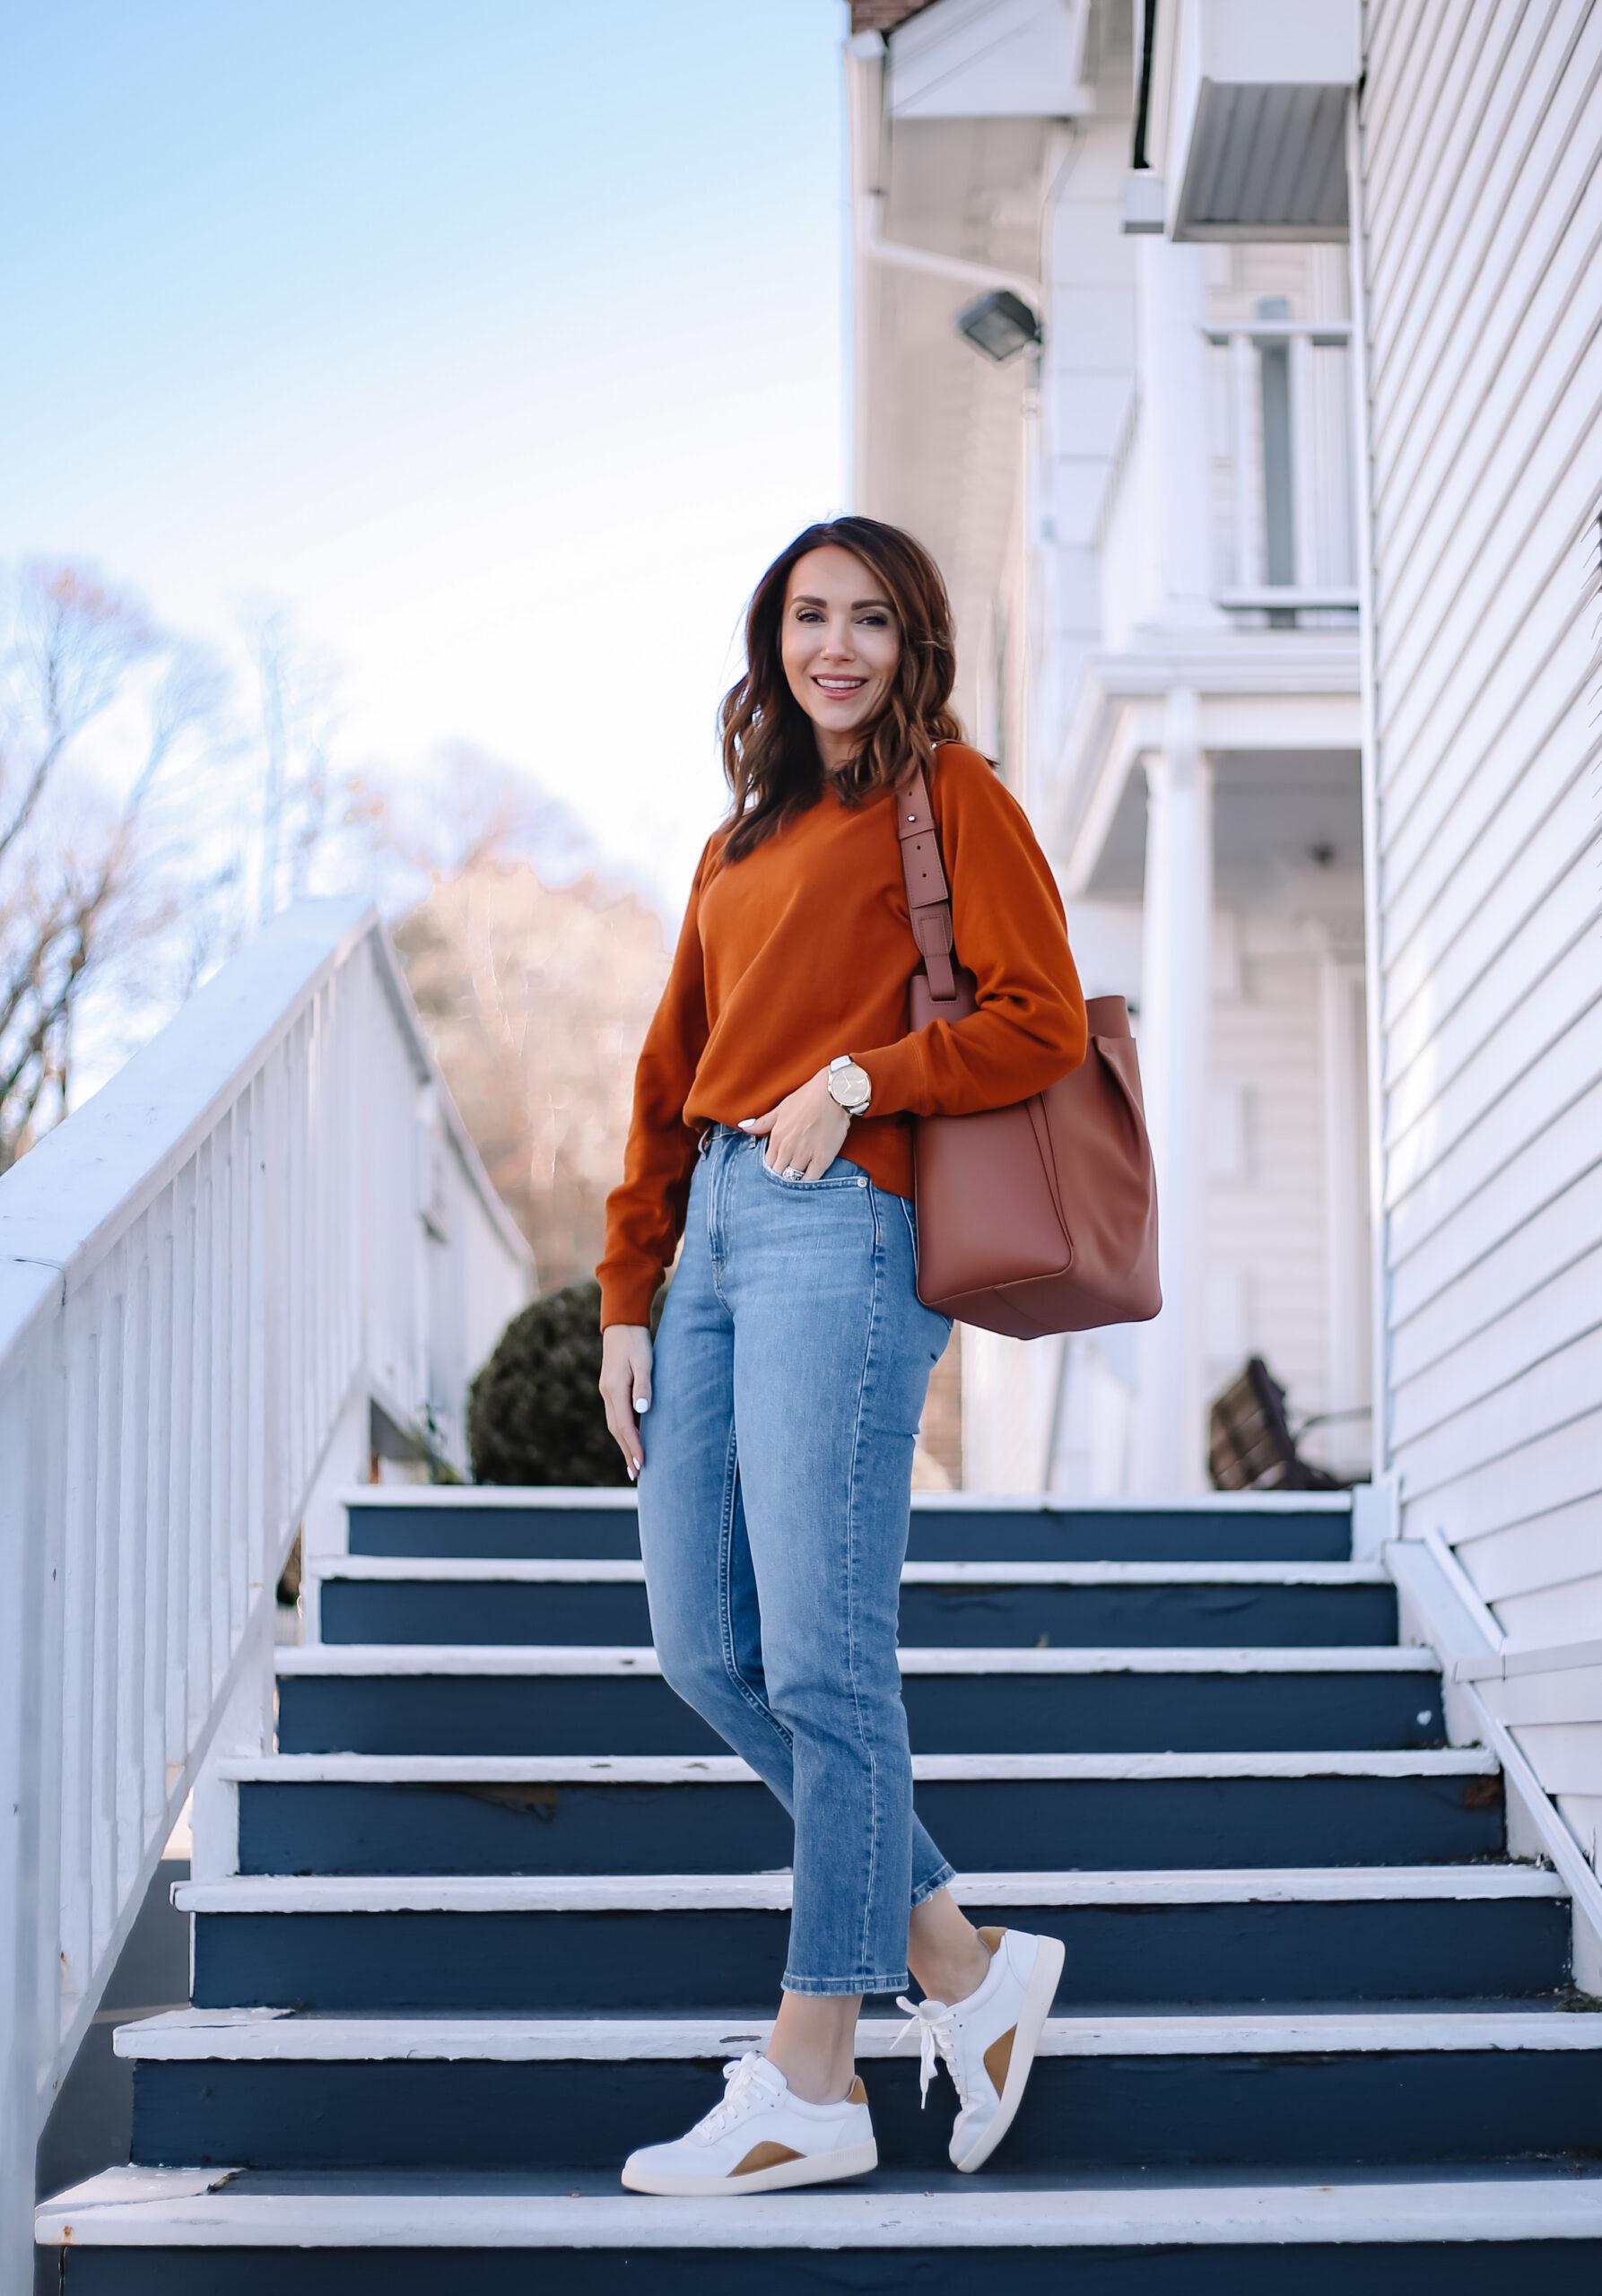 everlane jeans, sweatshirt, weekend style